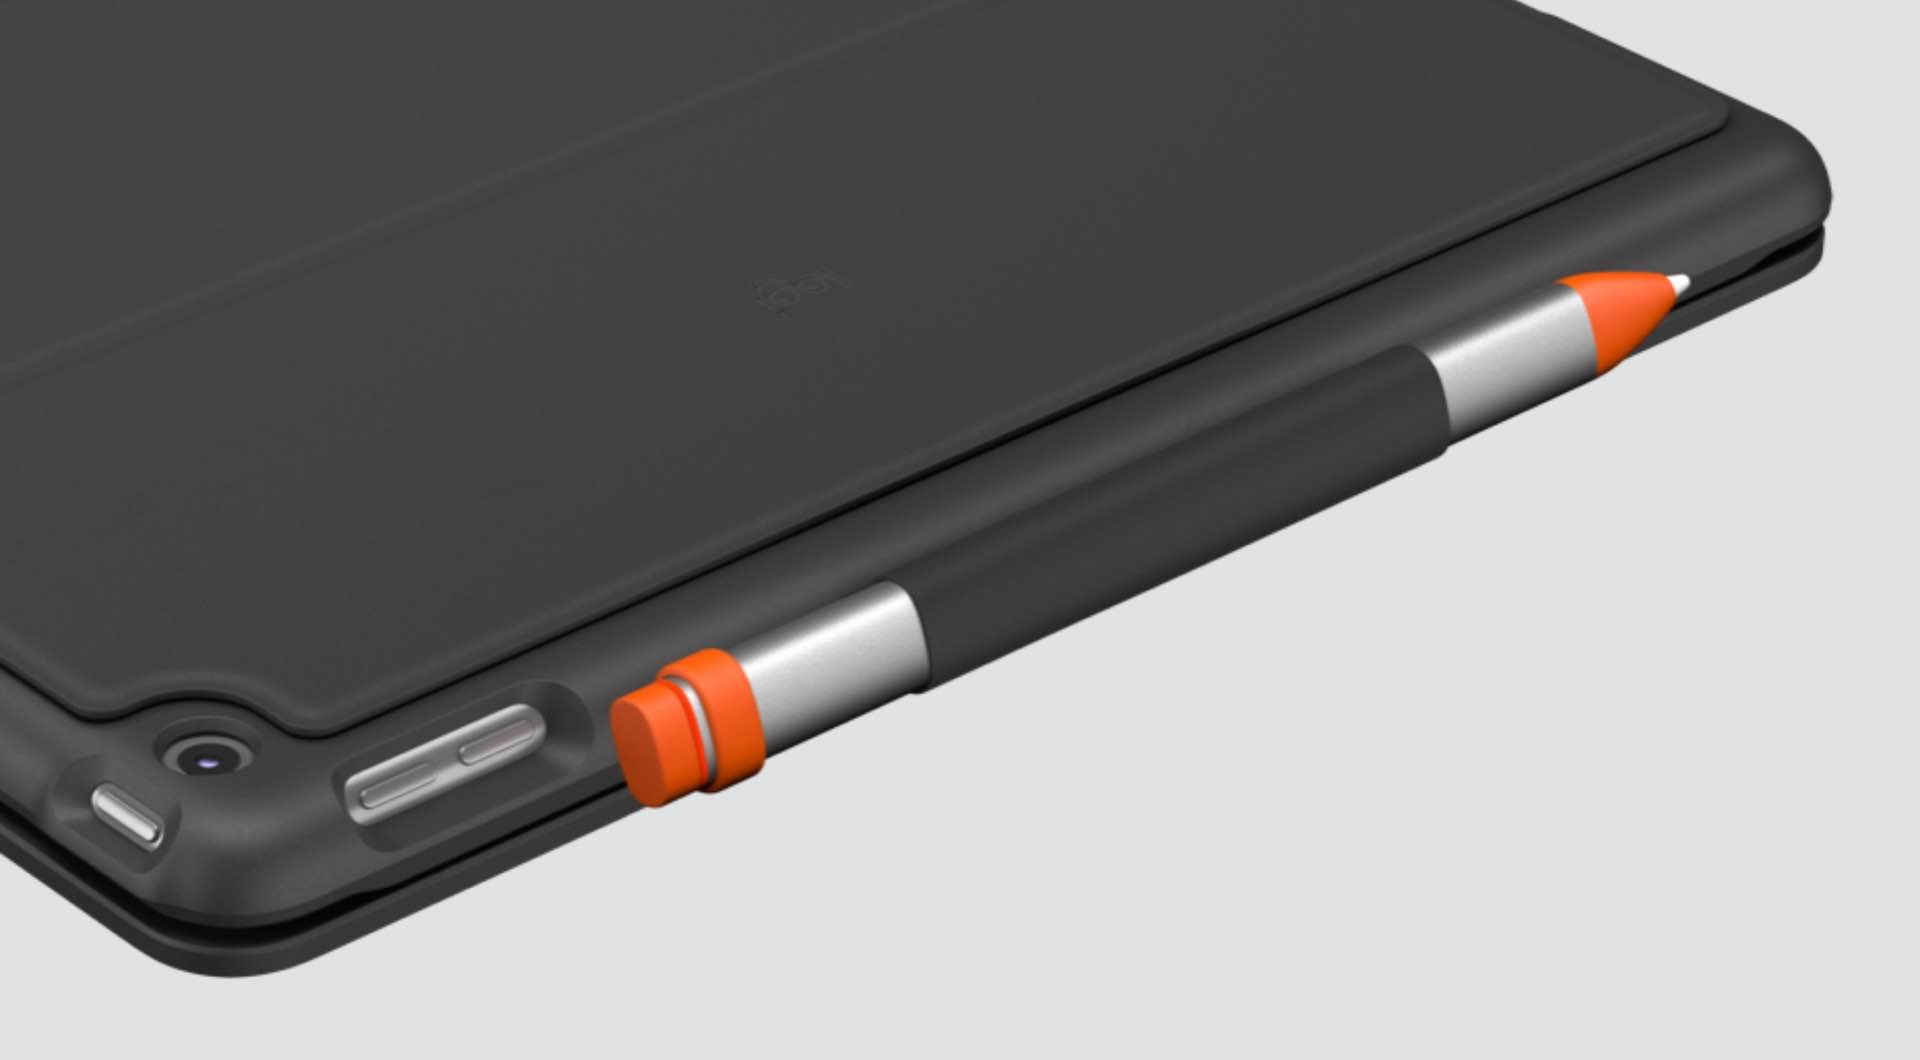 logitech-slim-folio-keyboard-case-for-8th-gen-ipad-2020-stylus-holder